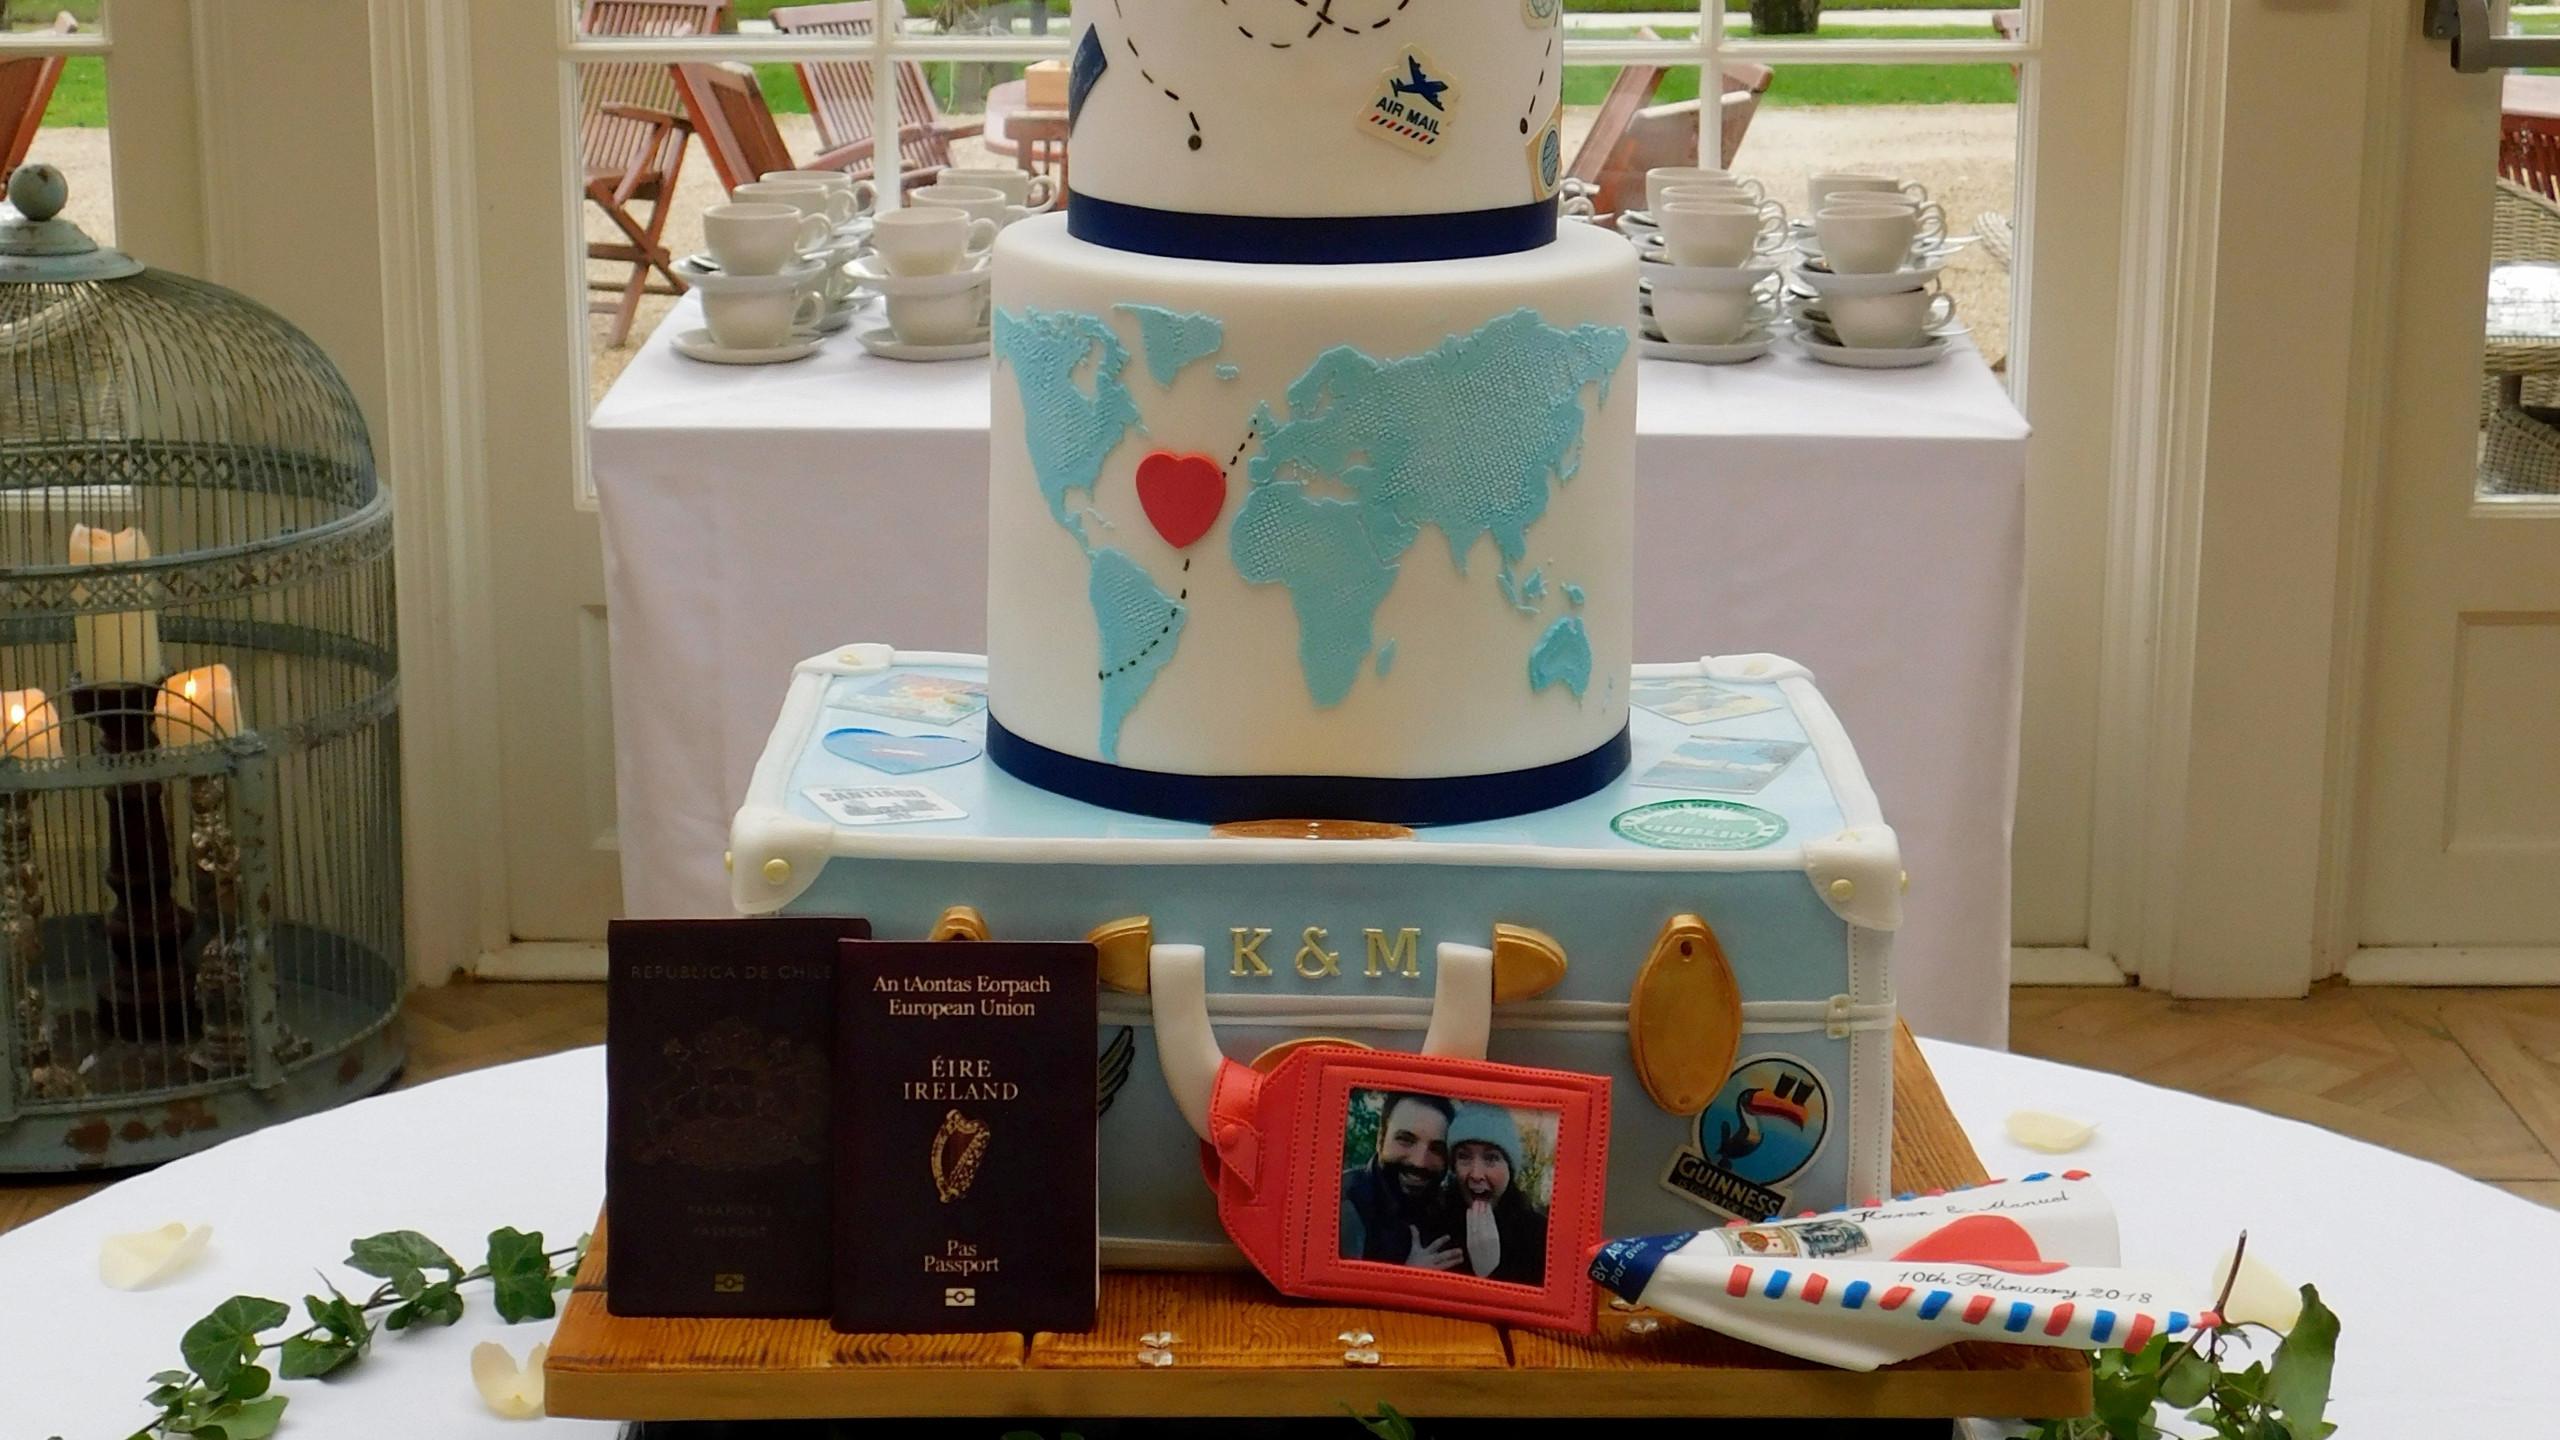 The Adventure Begins Wedding Cake